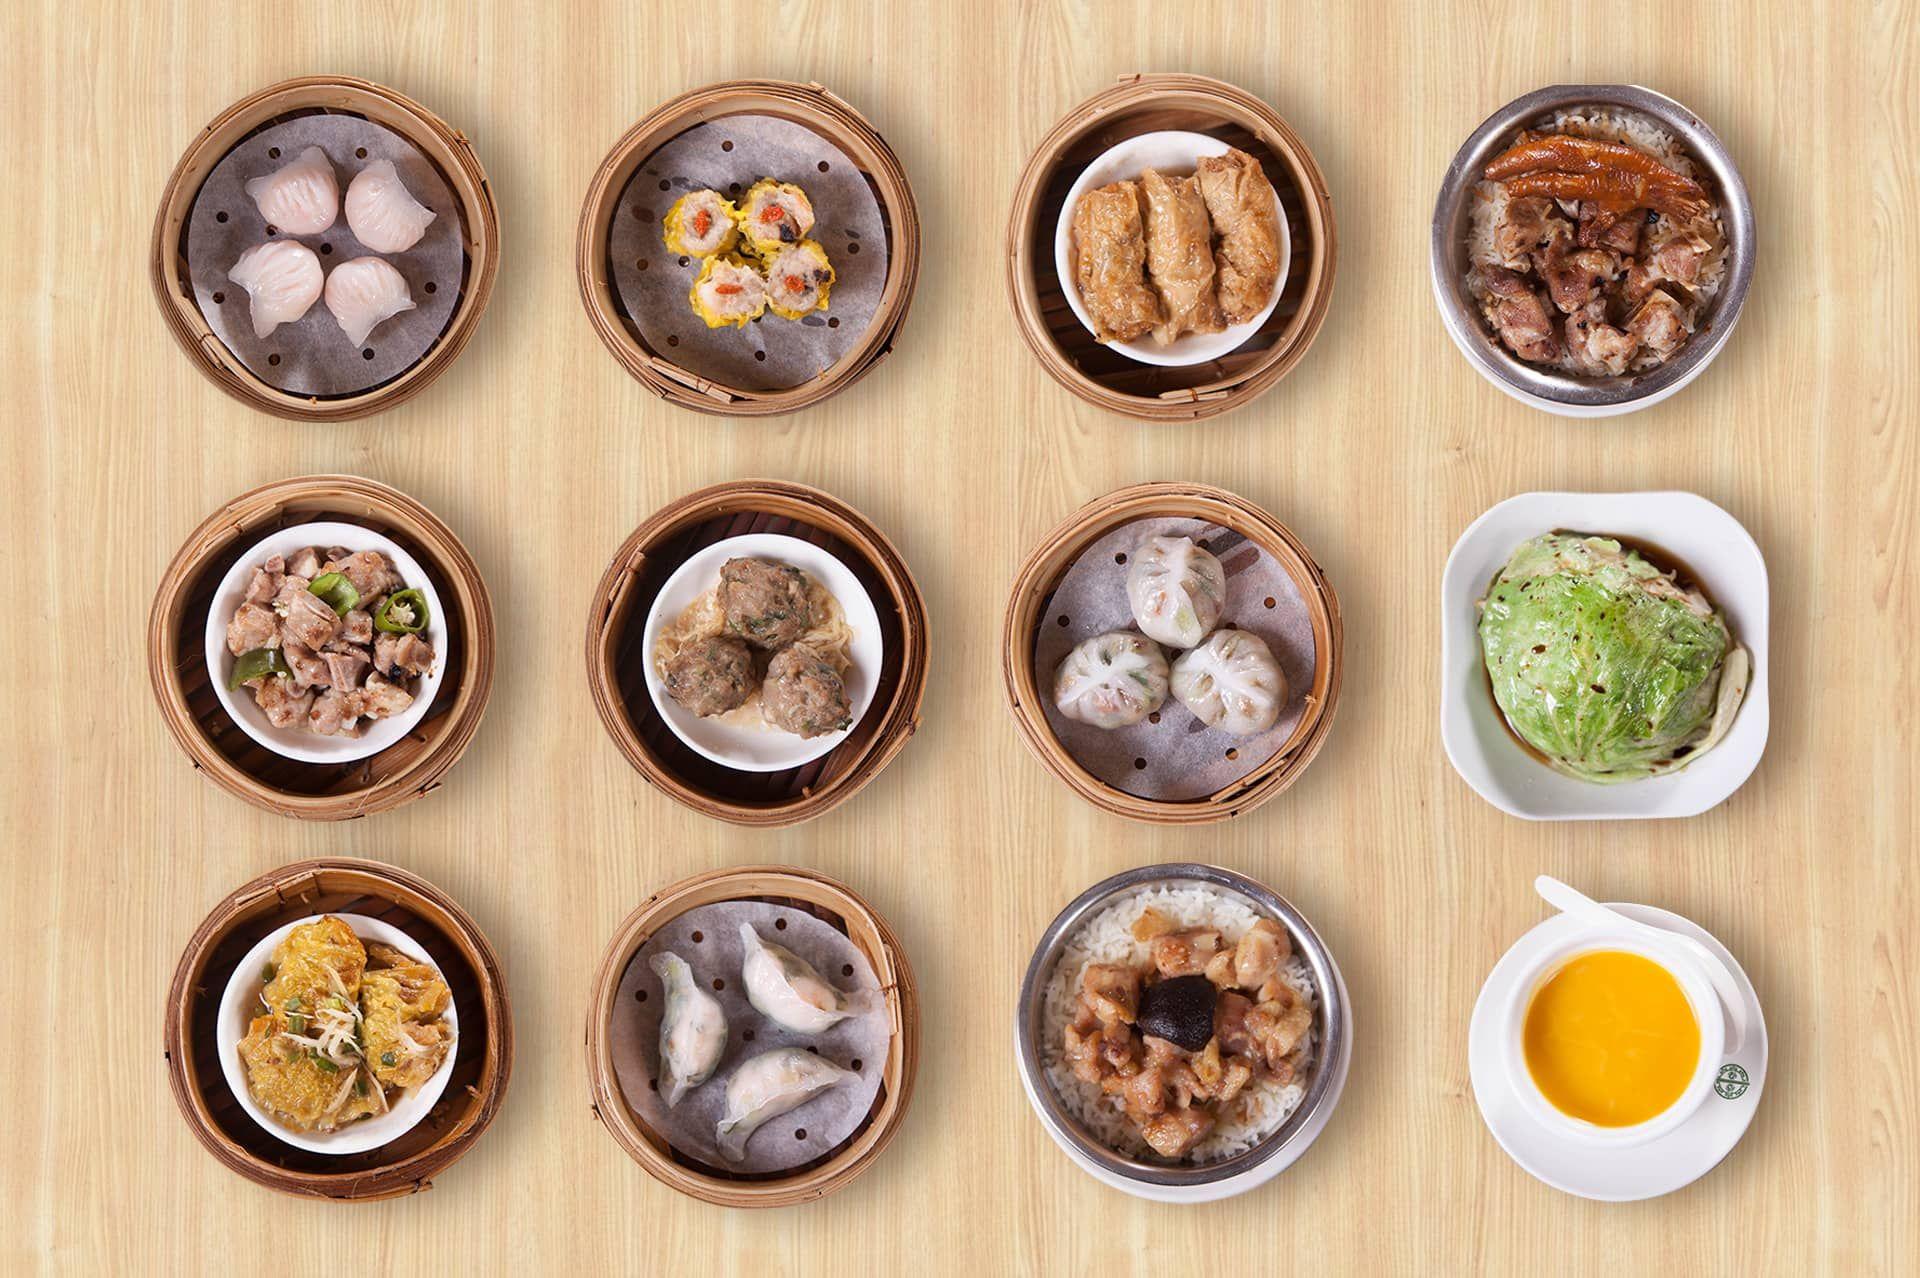 Tim Ho Wan Is A Chinese Dim Sum Restaurant Hong Kong Travel Hong Kong Itinerary Dim Sum